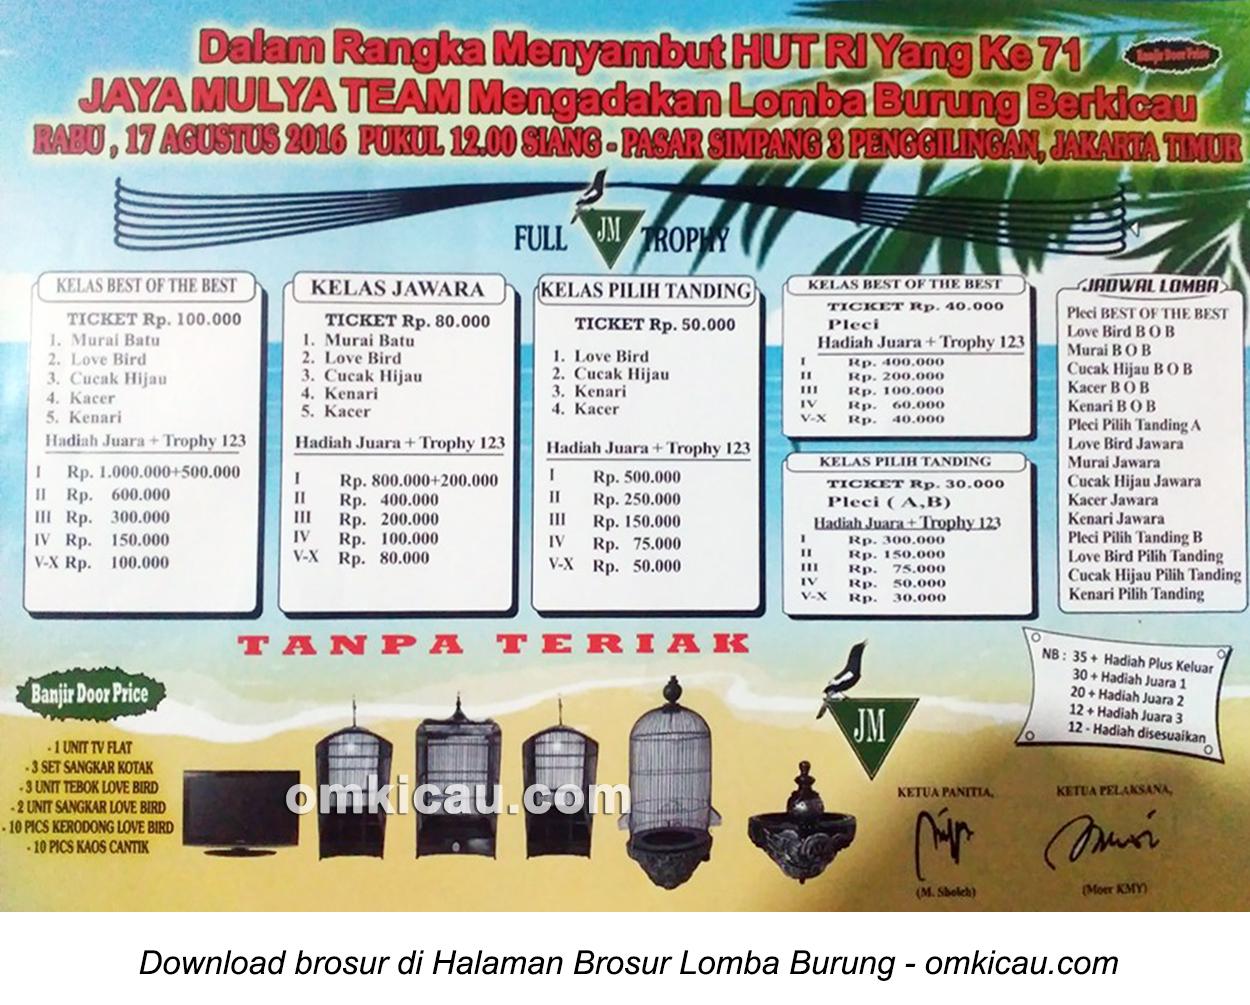 Brosur Lomba Burung Berkiau Jaya Mulya Team, Jakarta Timur, 17 Agustus 2016